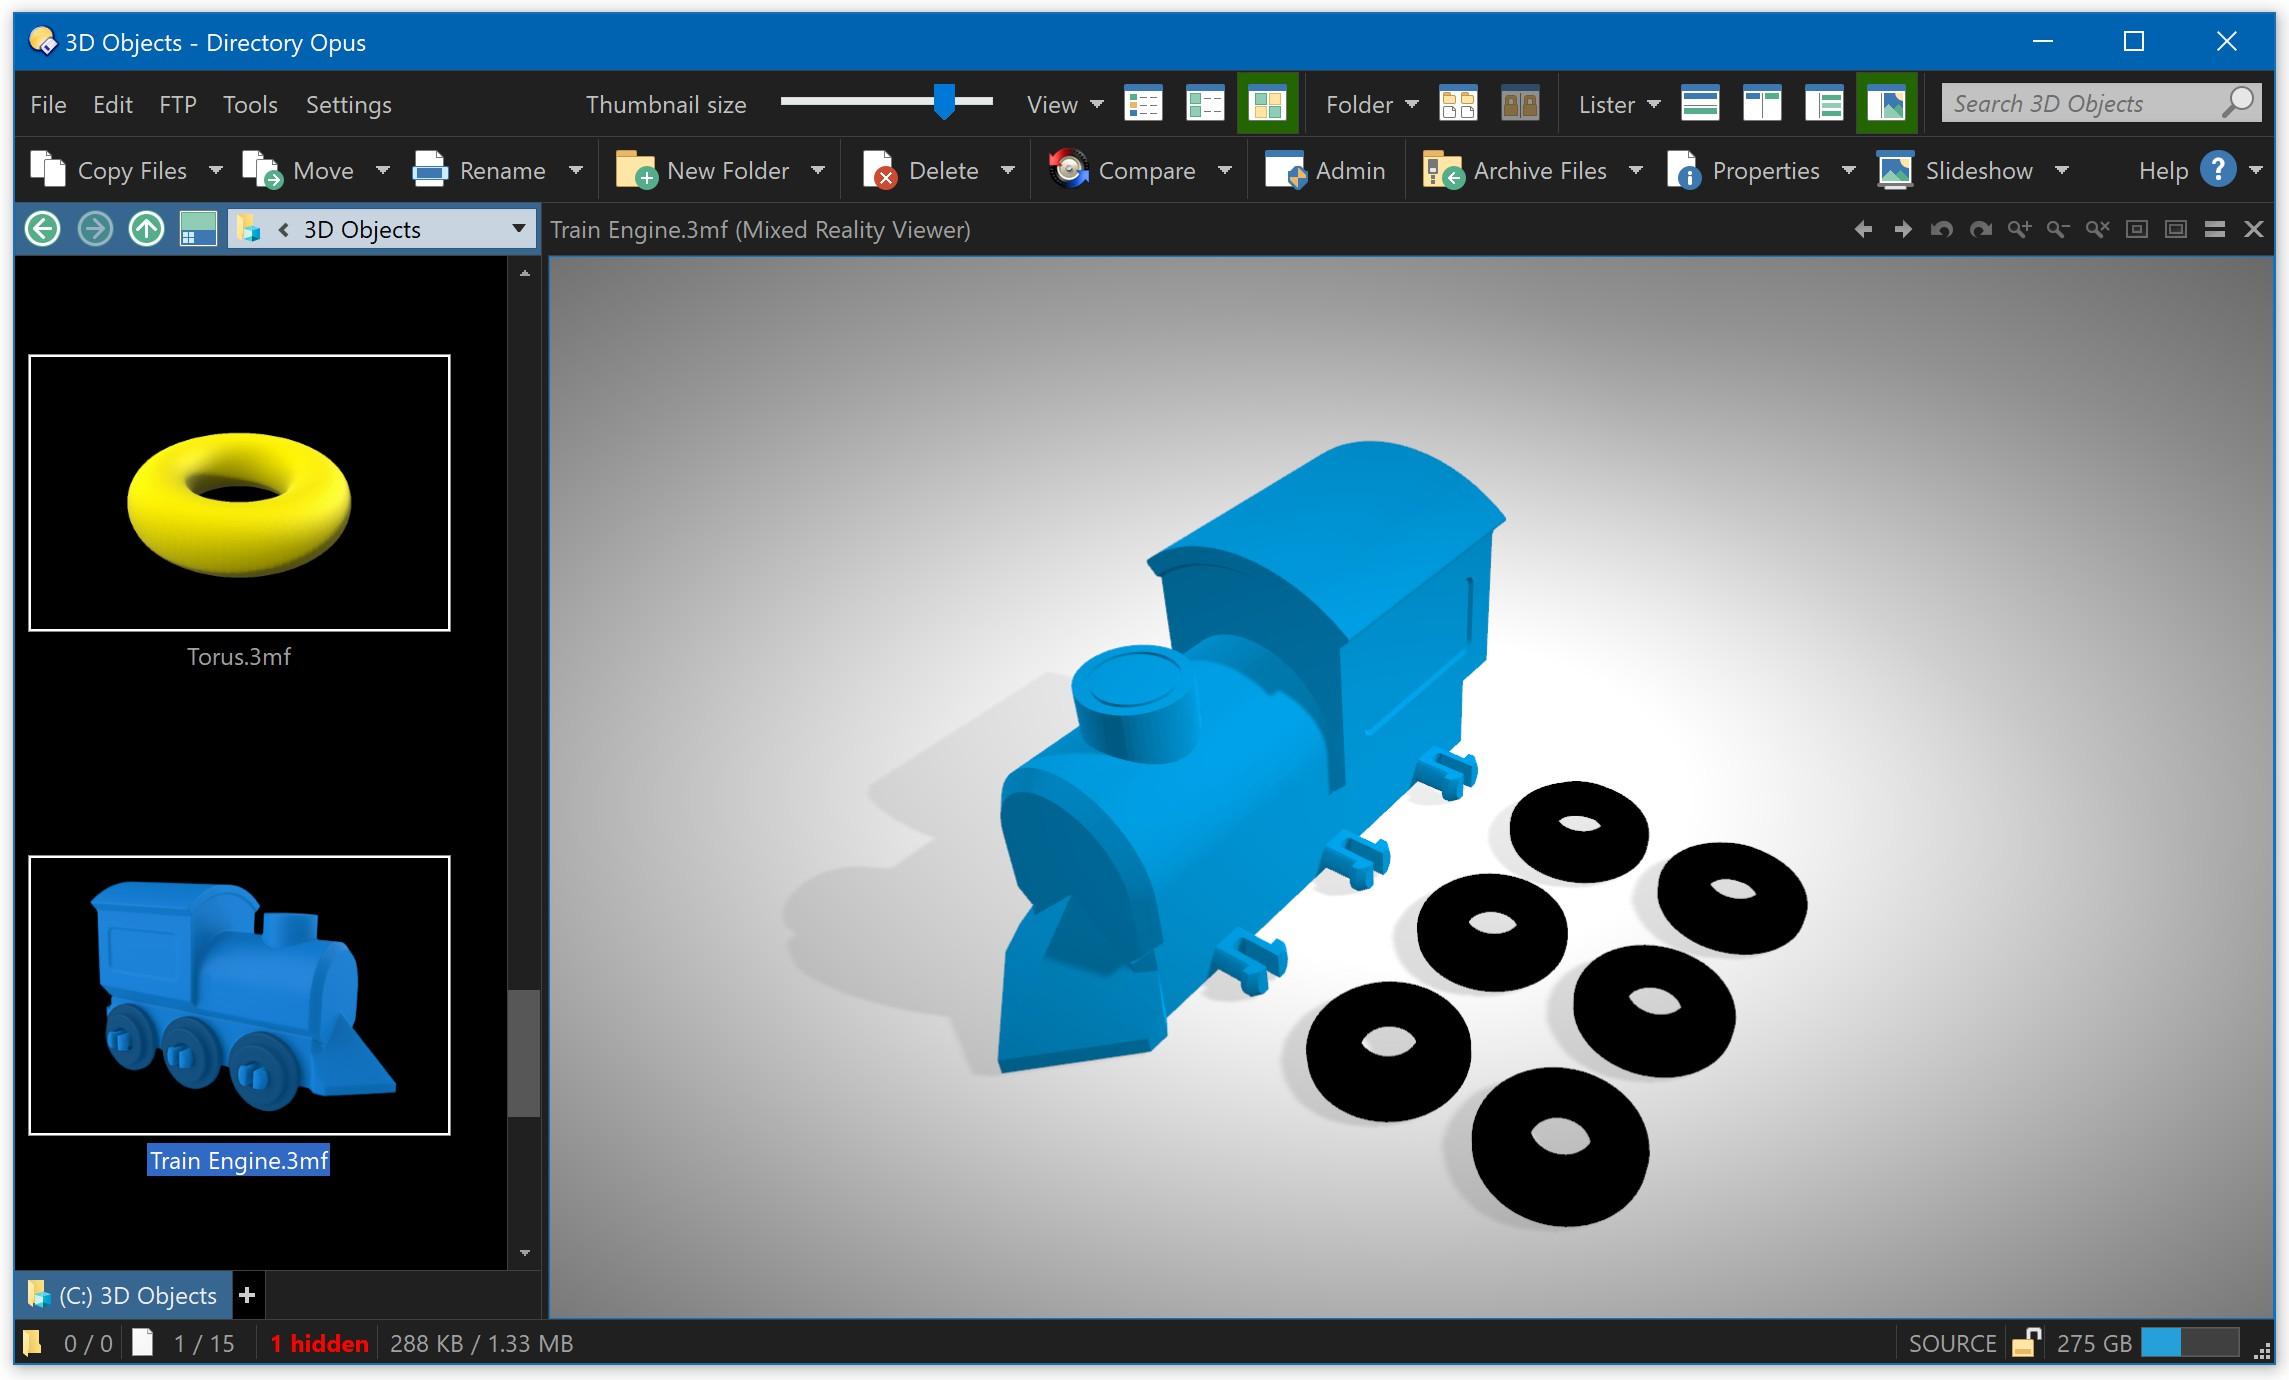 3D Object preview (3mf, fbx, glb, gltf, obj, ply, stl